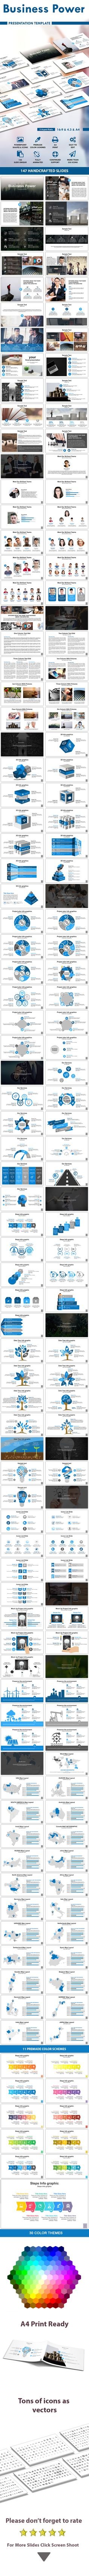 Business Power powerpoint Presentation Template - Business PowerPoint Templates